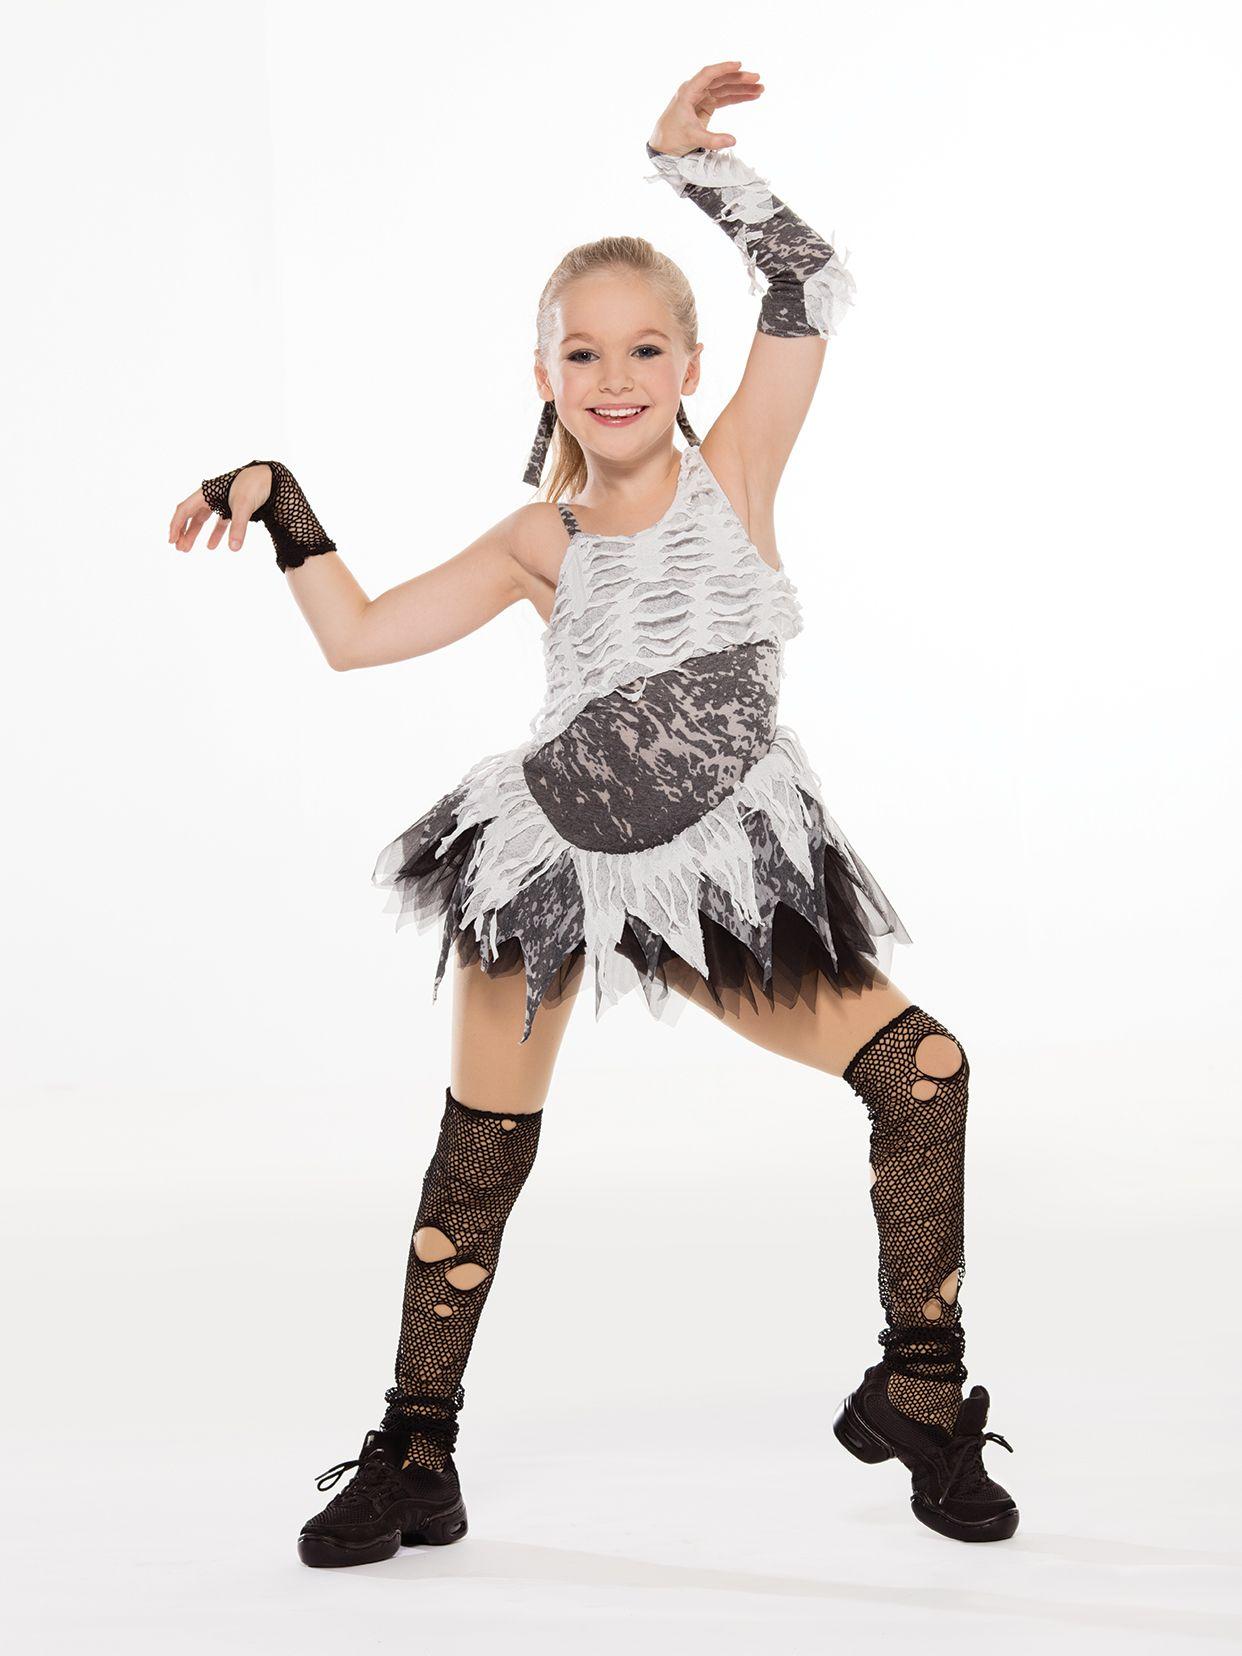 92e27305a63fc Thriller | Revolution Dancewear Alice In Wonderland Ballet, Aerial Costume,  Dance Recital, Ballet